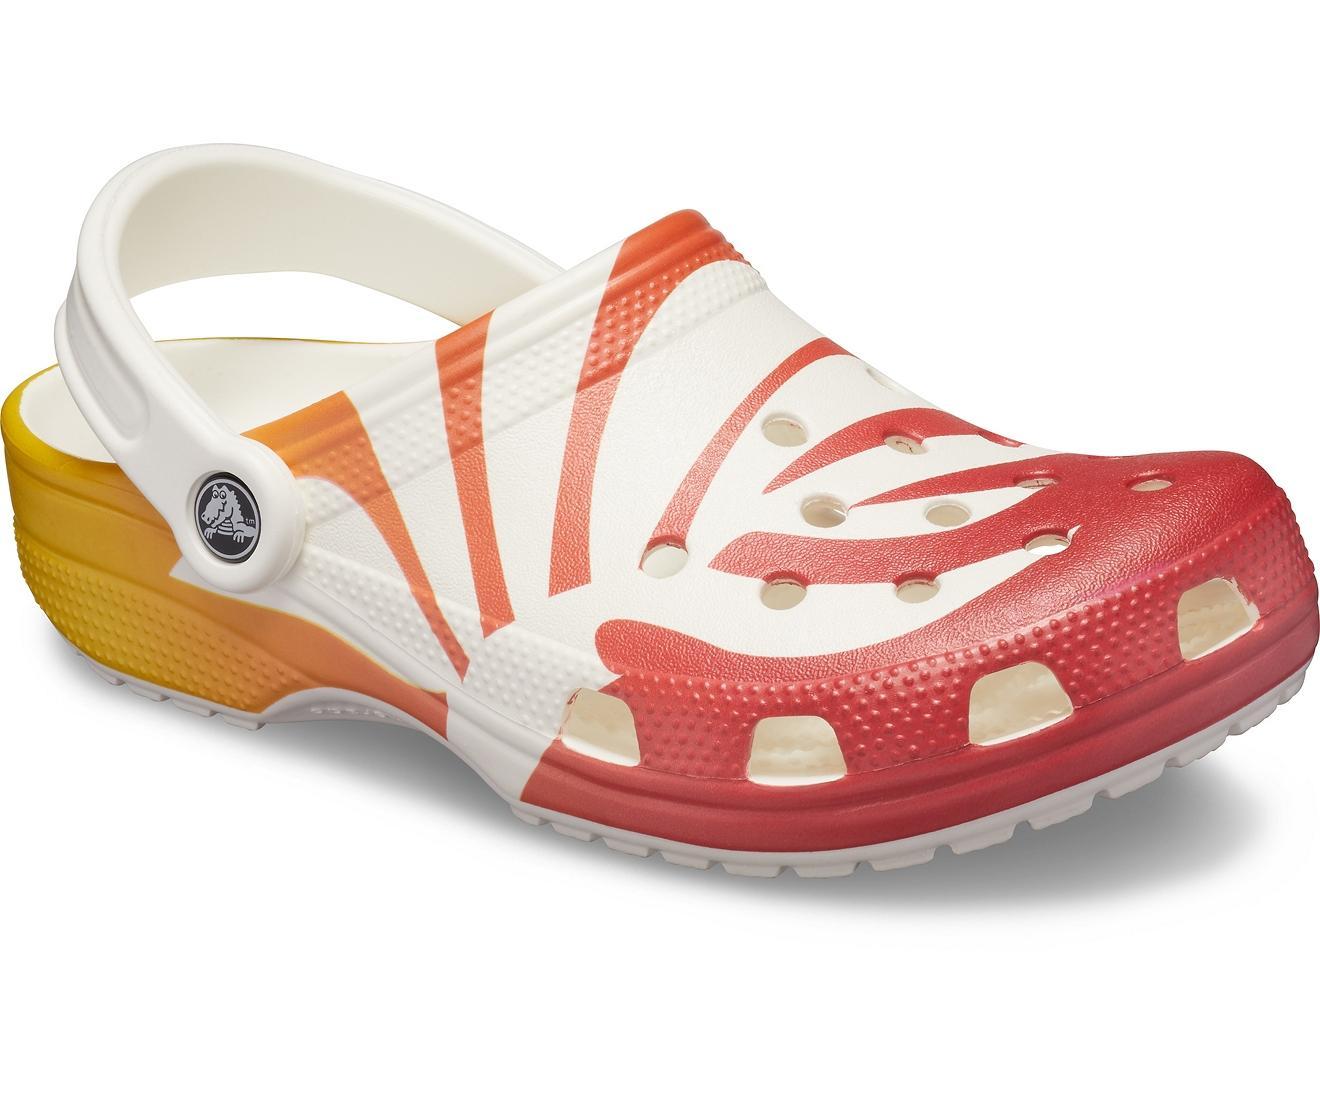 21096bb01 Lyst - Crocs™ Classic Seasonal Graphic Clog in White